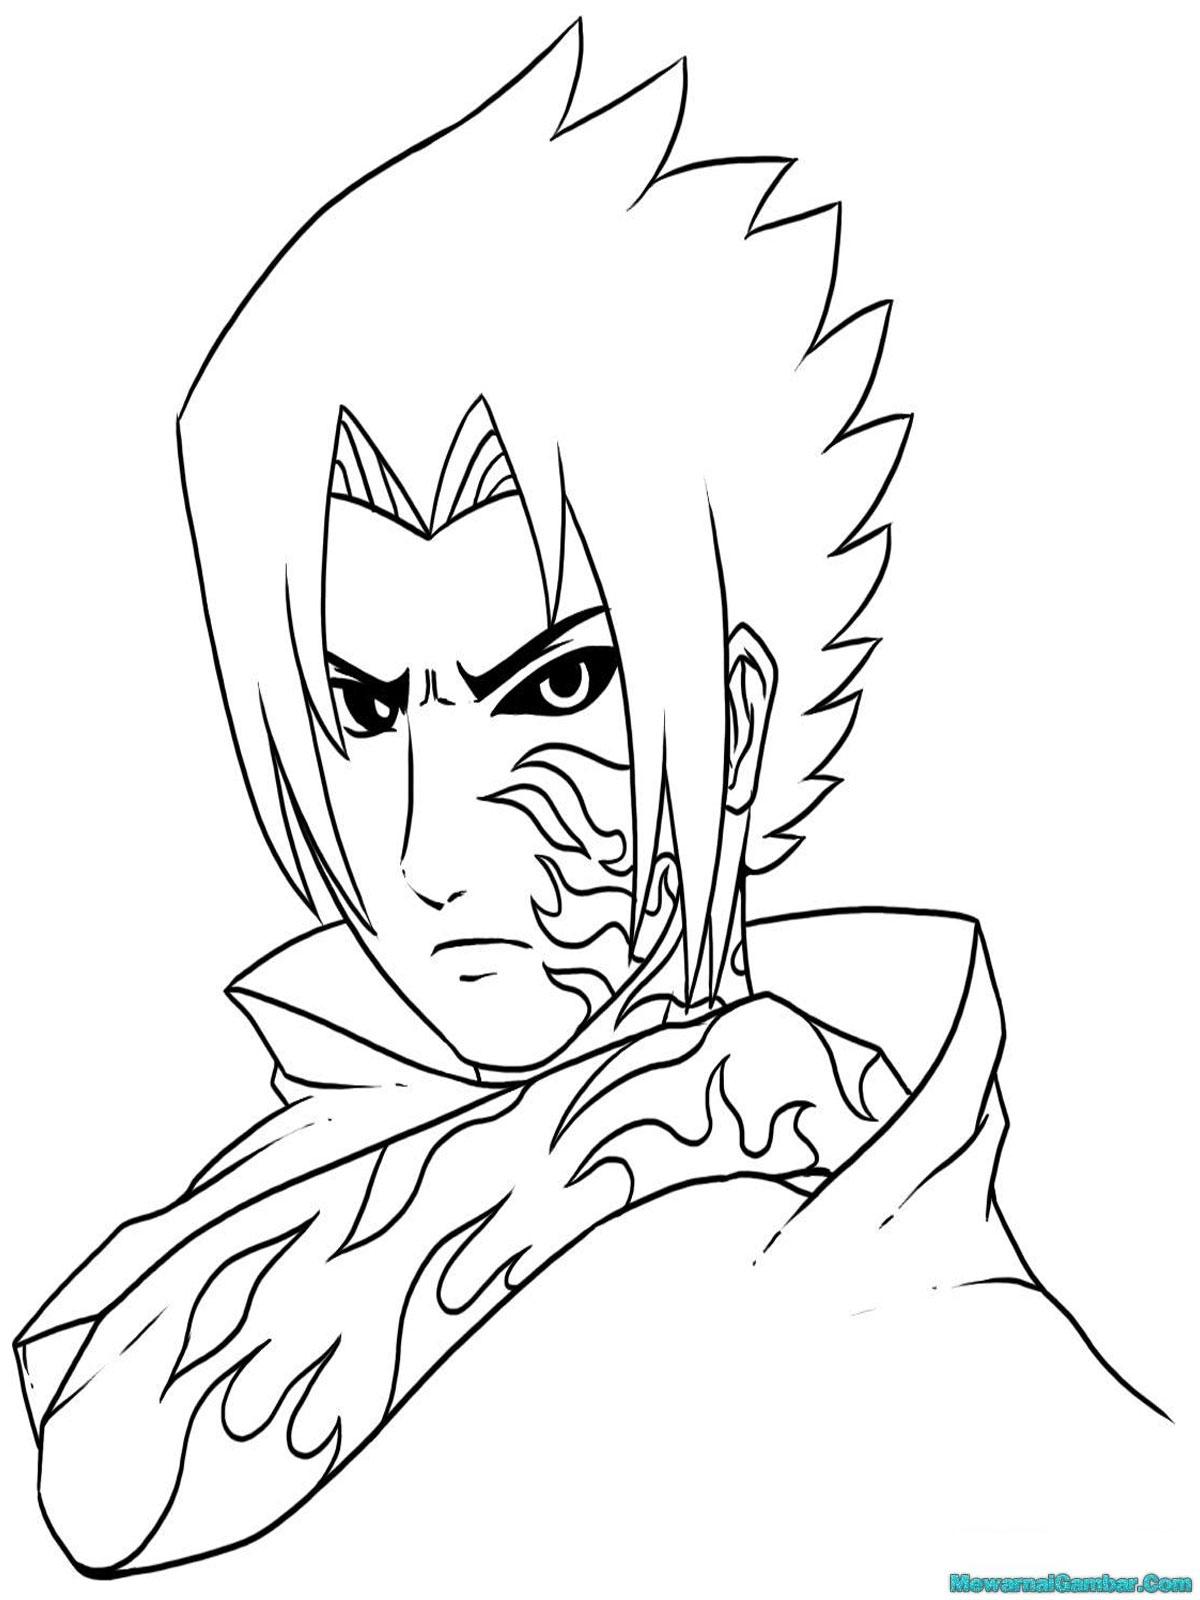 Gambar Sasuke Hitam Putih : gambar, sasuke, hitam, putih, Gambar, Hitam, Putih, Sasuke, Terbaik, Infobaru